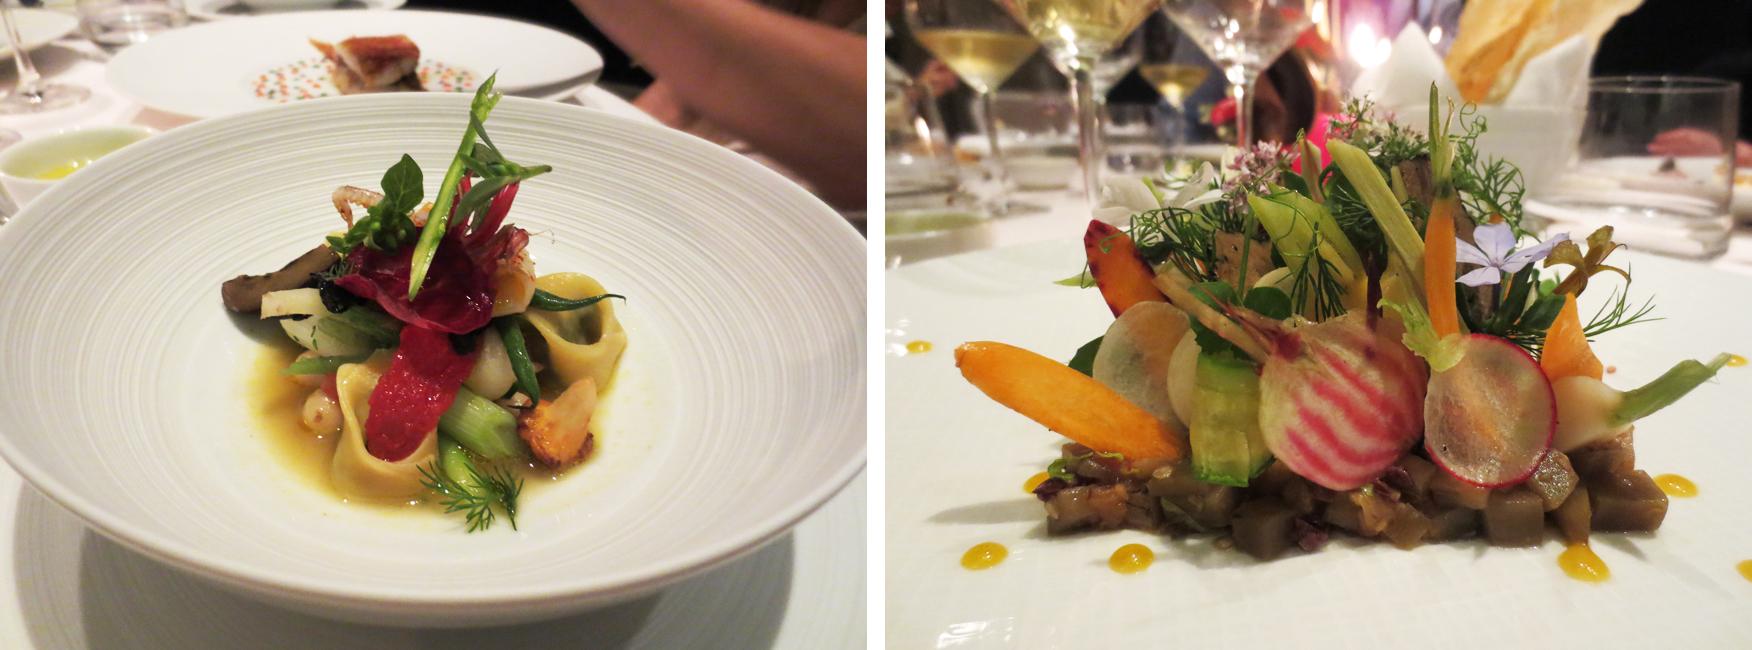 Chevre d'Or pasta dish+salad_web.jpg